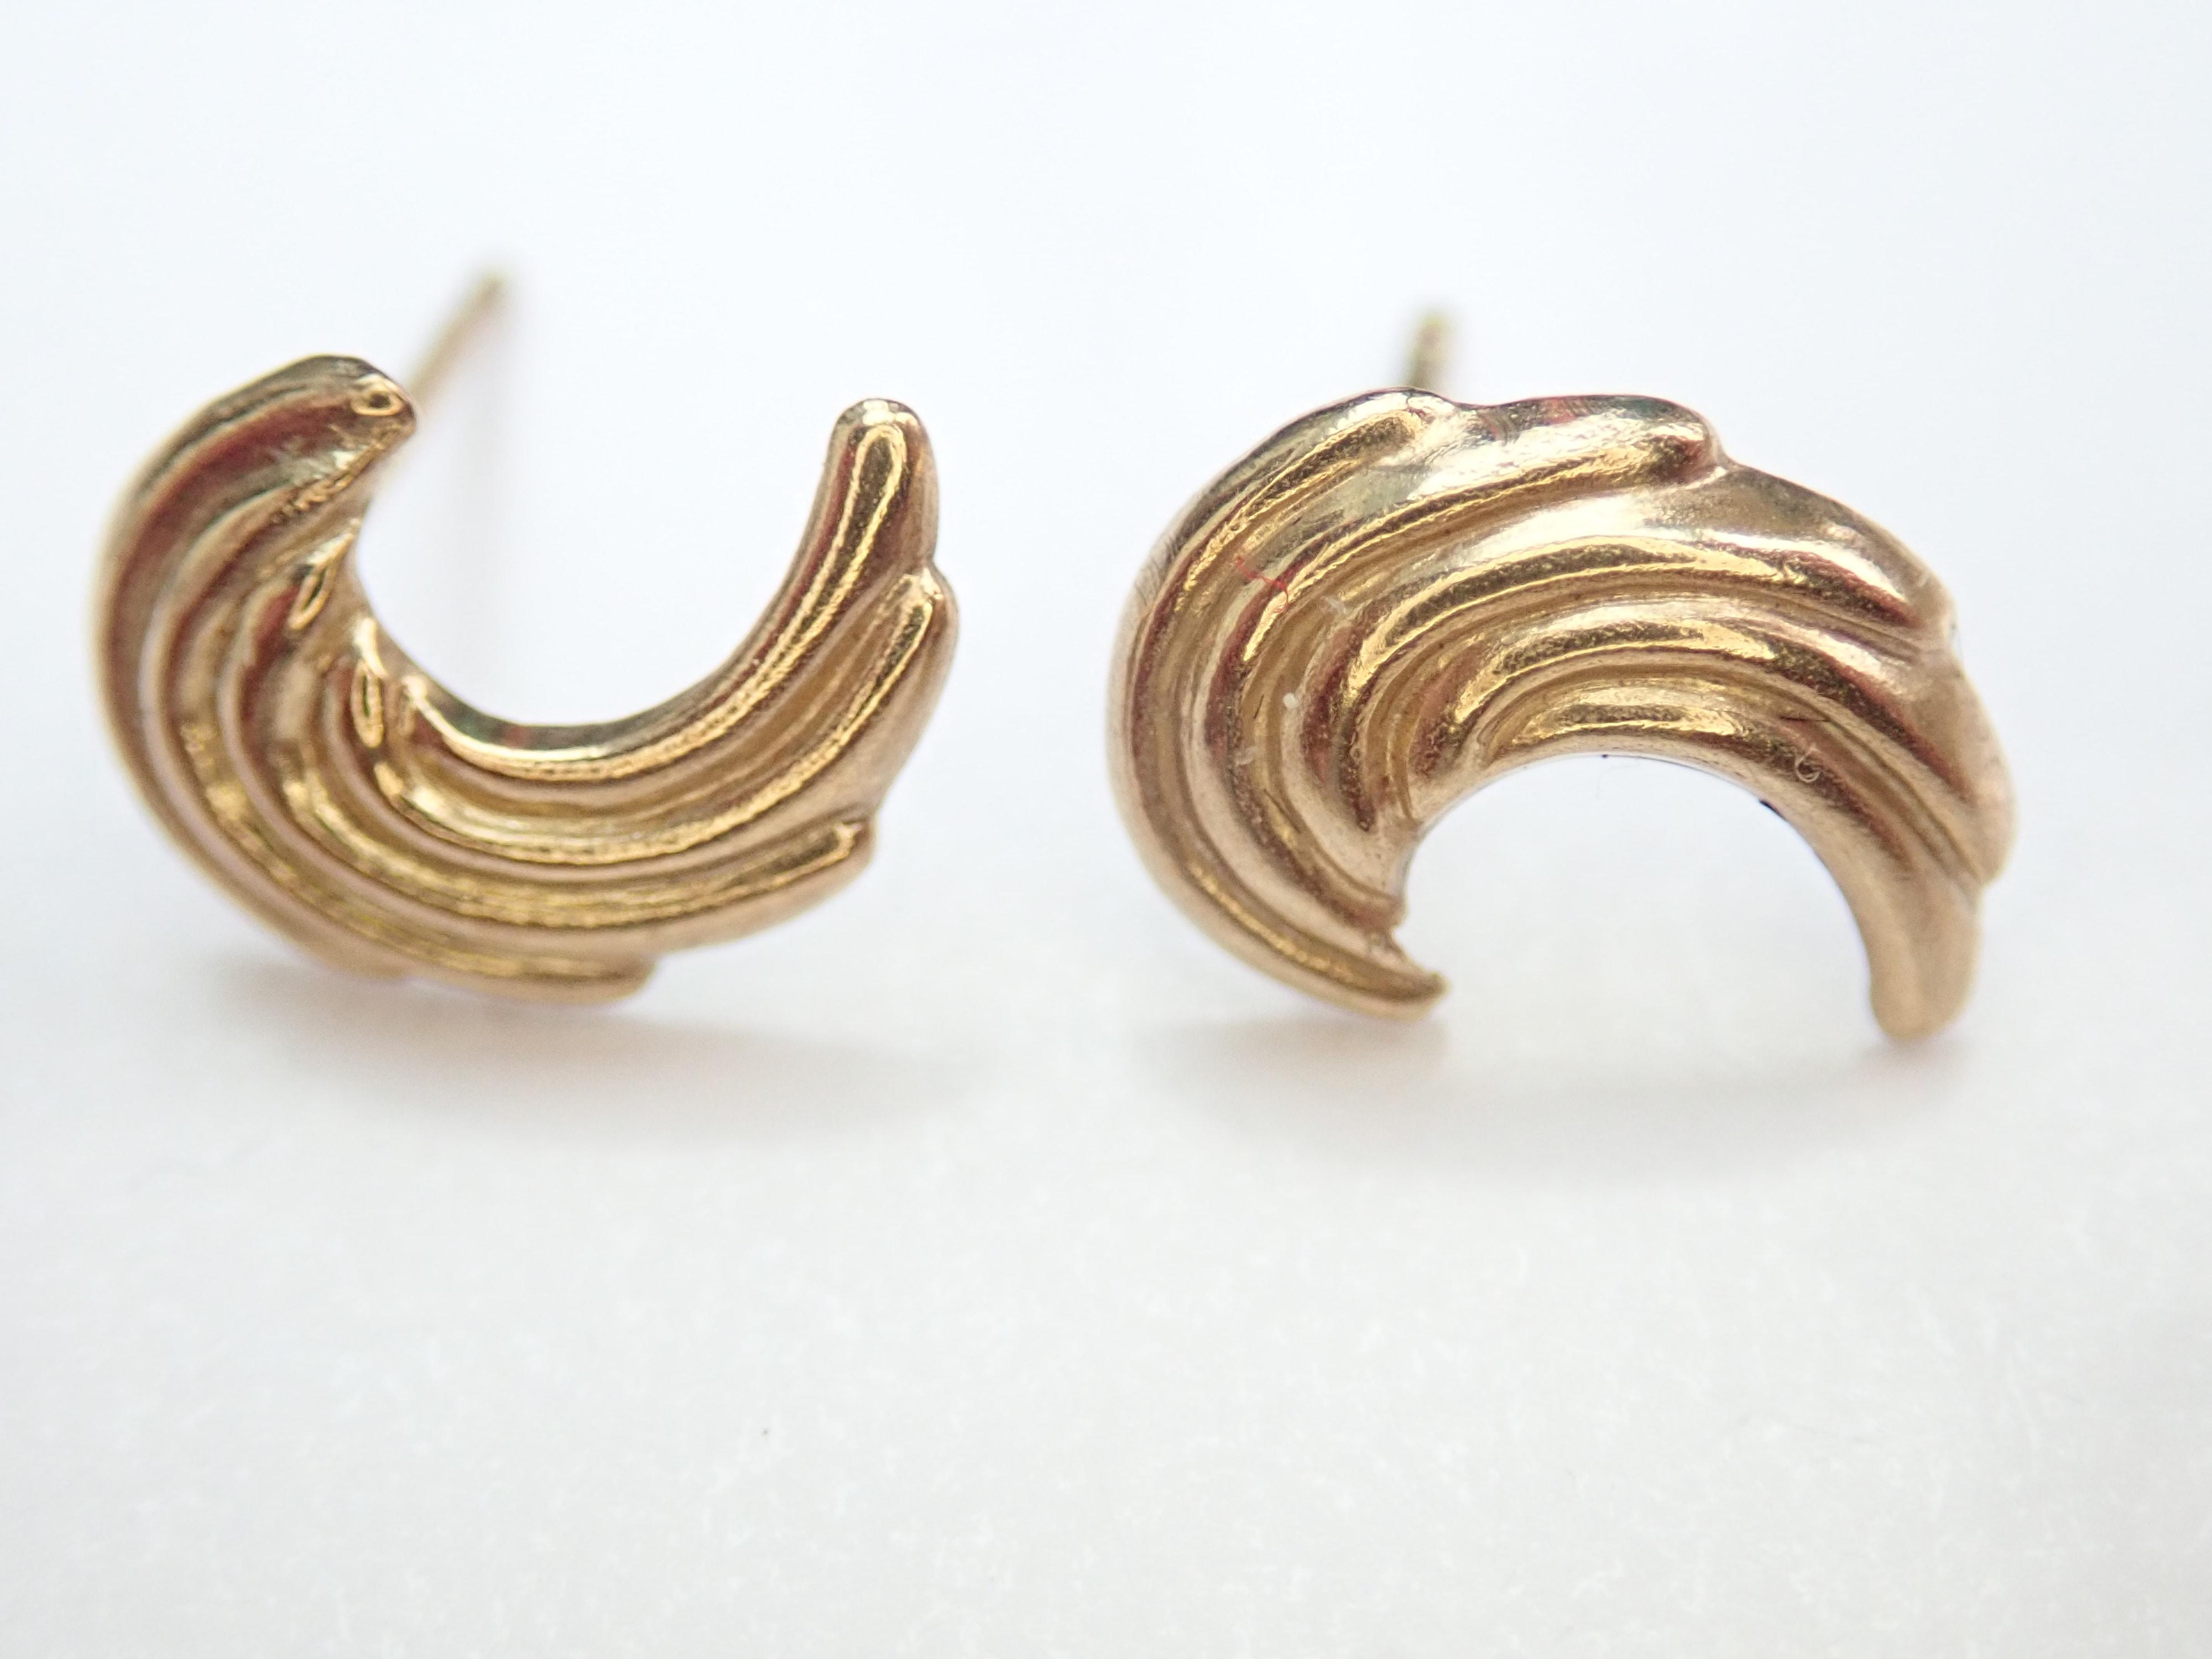 Solid 9k Yellow Patterned Wing Earrings & Butterfly's 0.25g #7